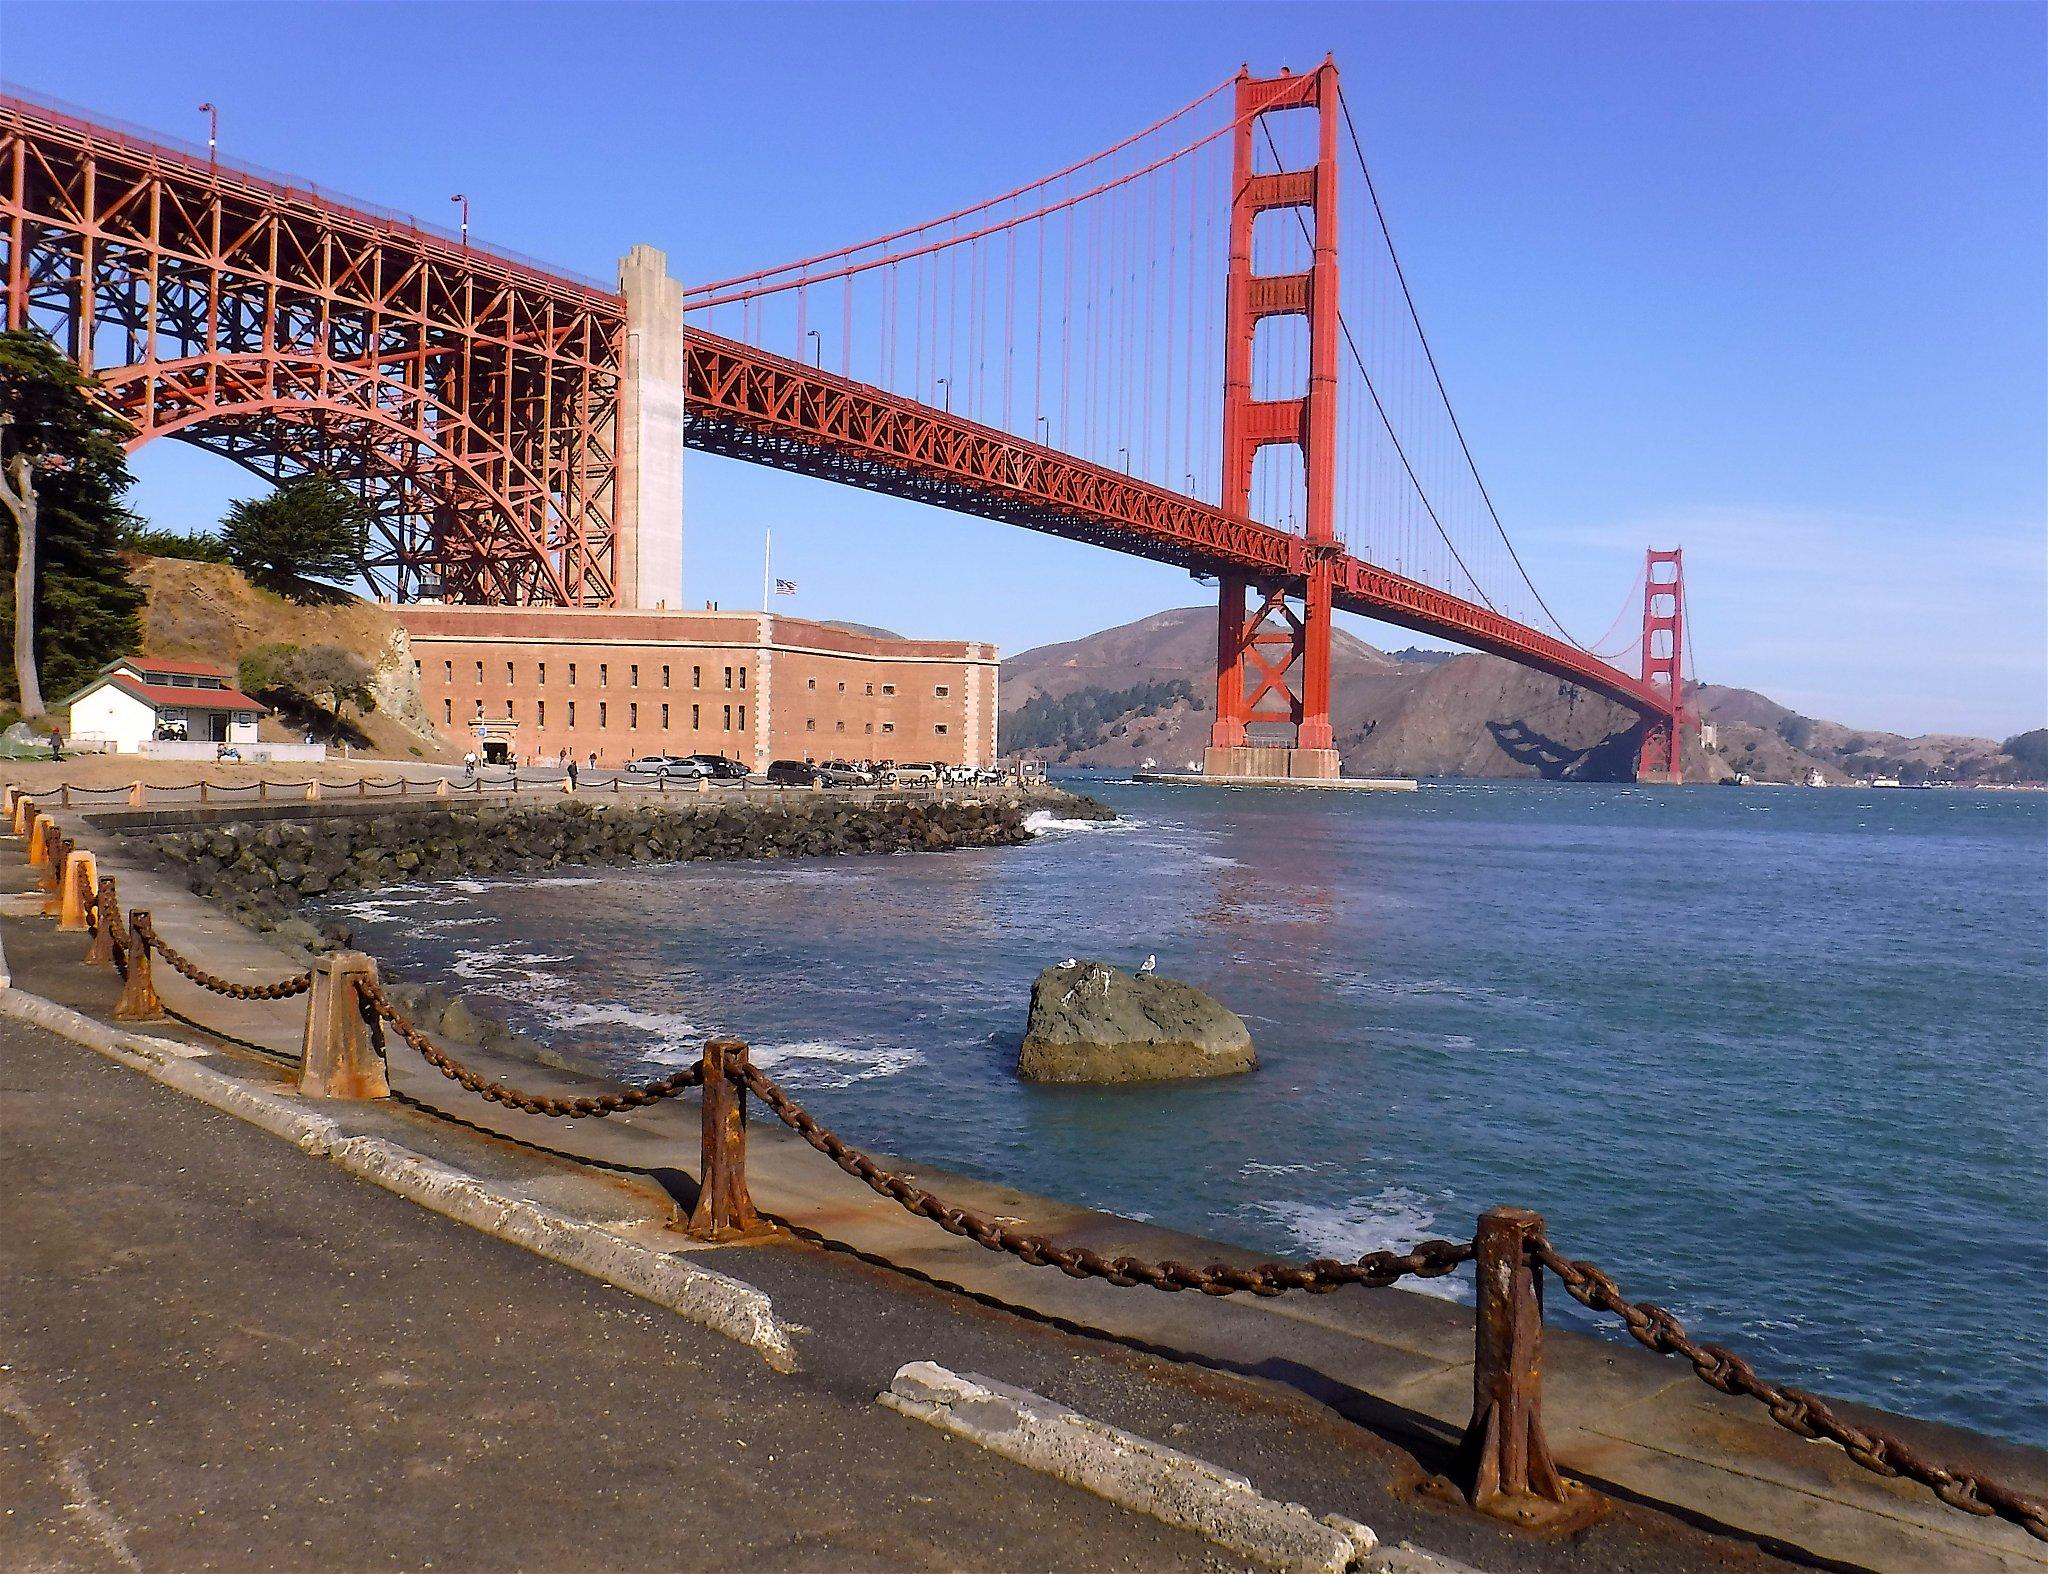 sunday getaway to the golden gate bridge sfchronicle com